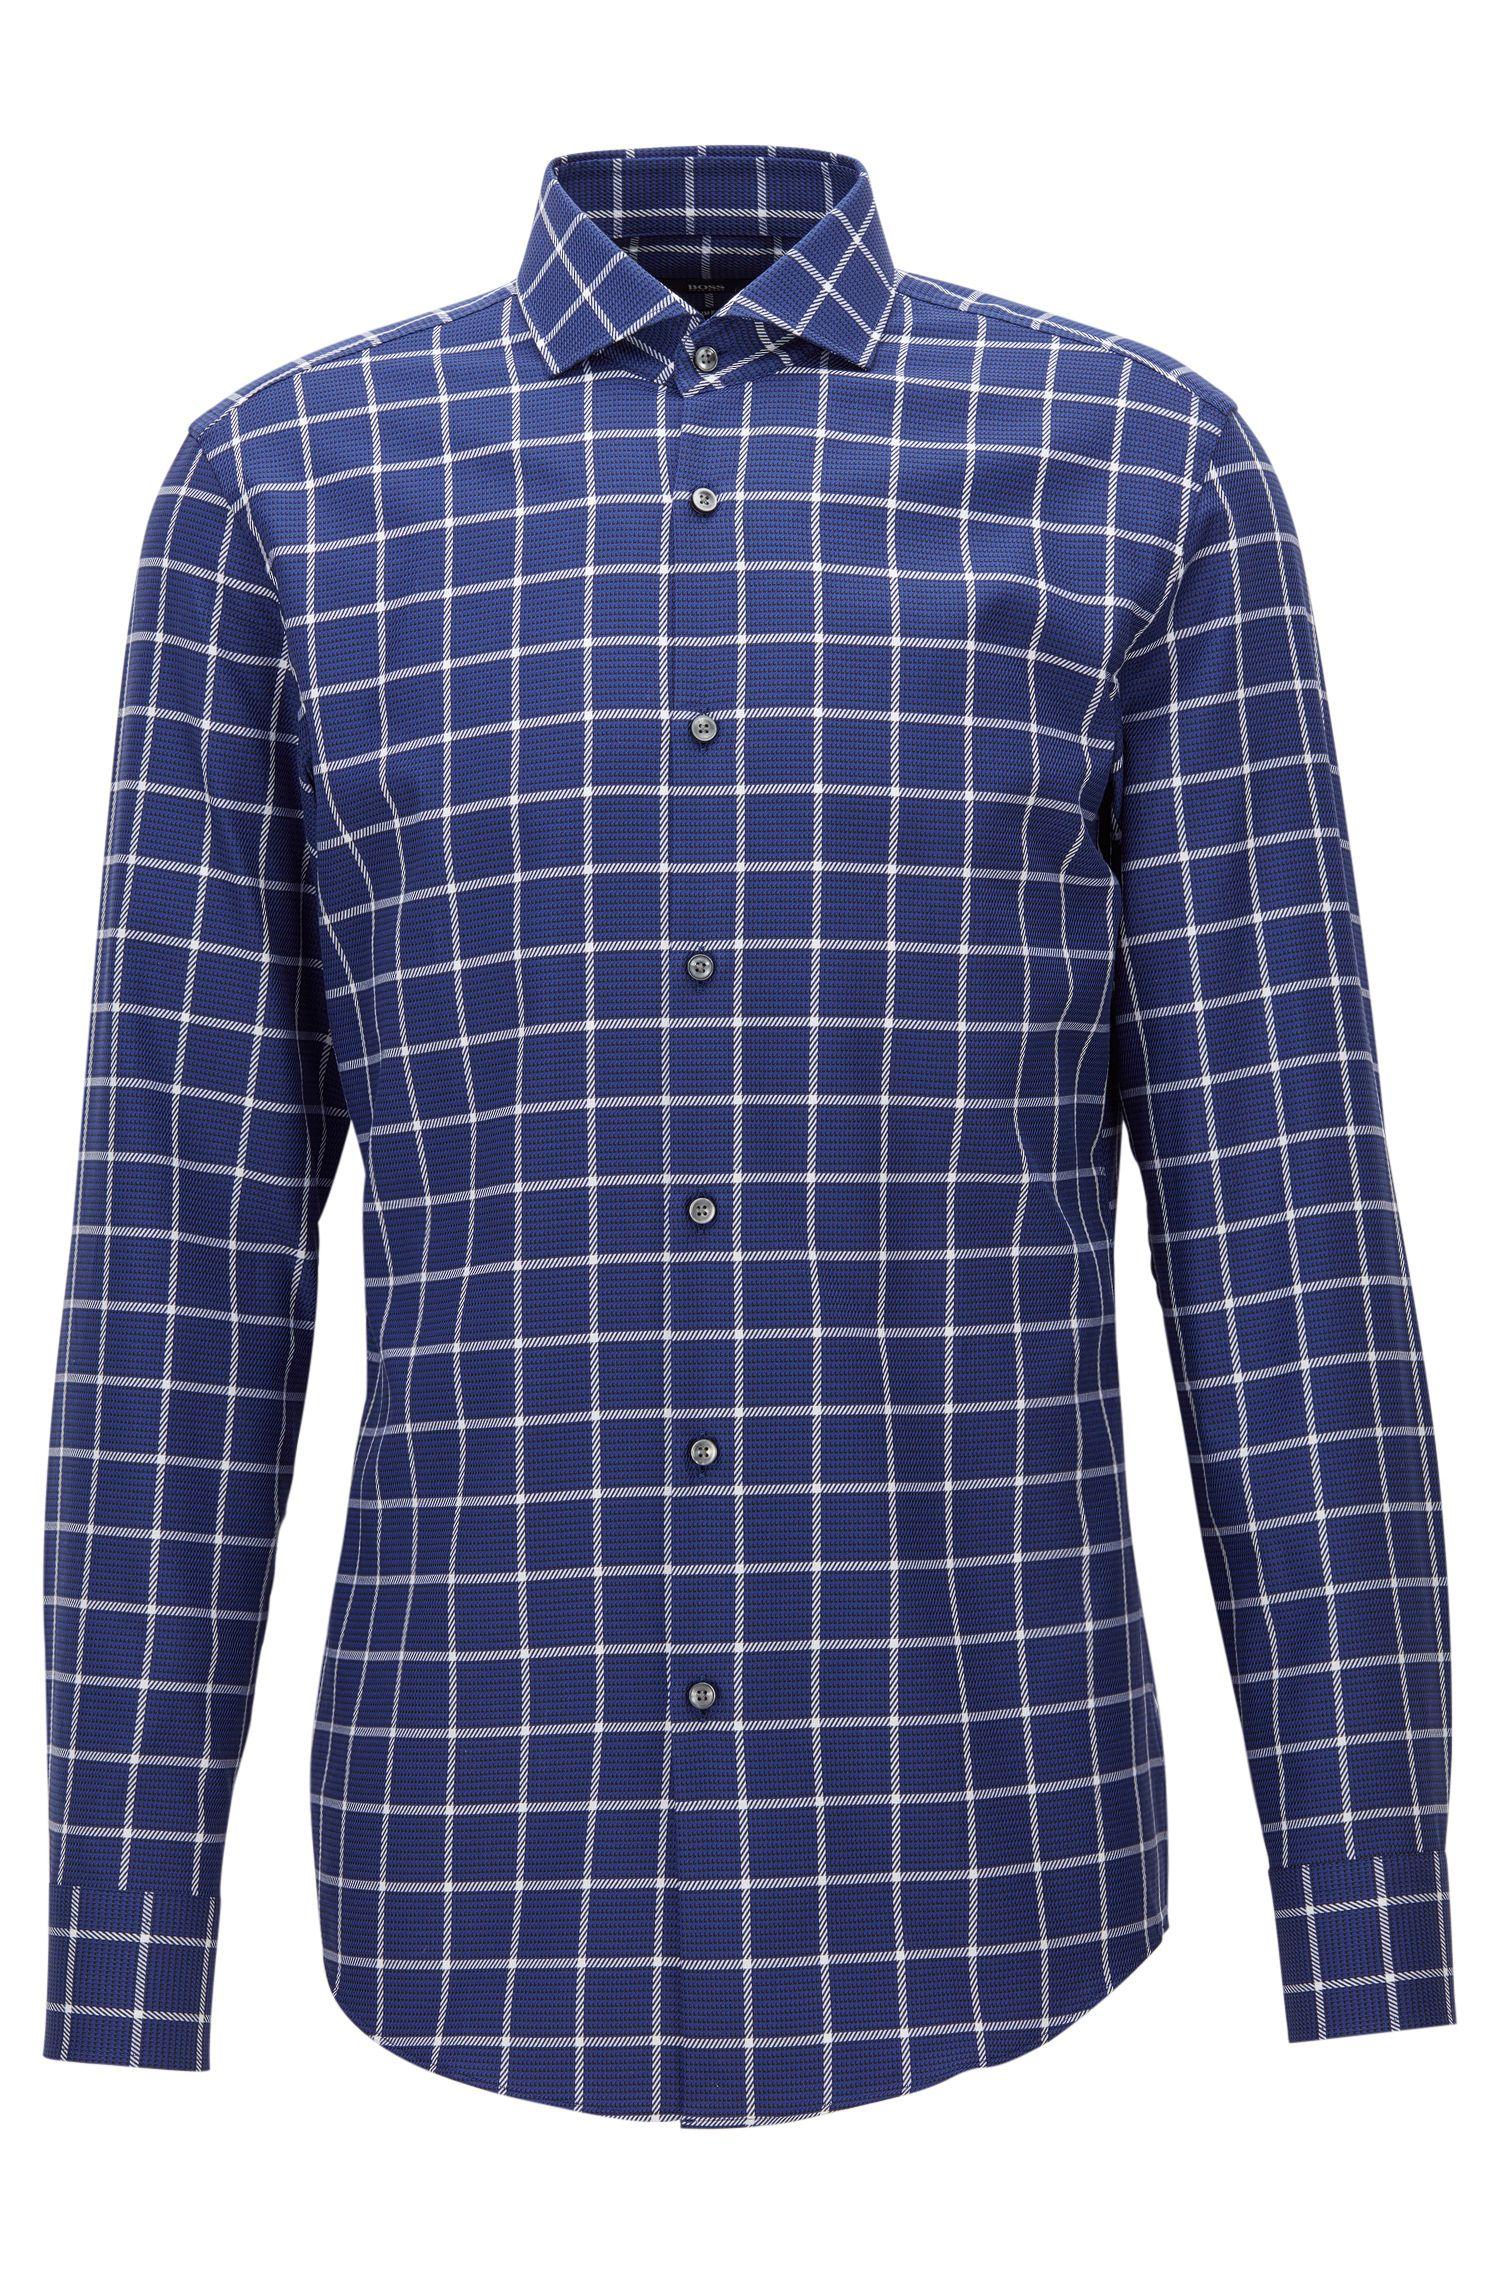 Plaid Cotton Dress Shirt, Slim Fit   Jason